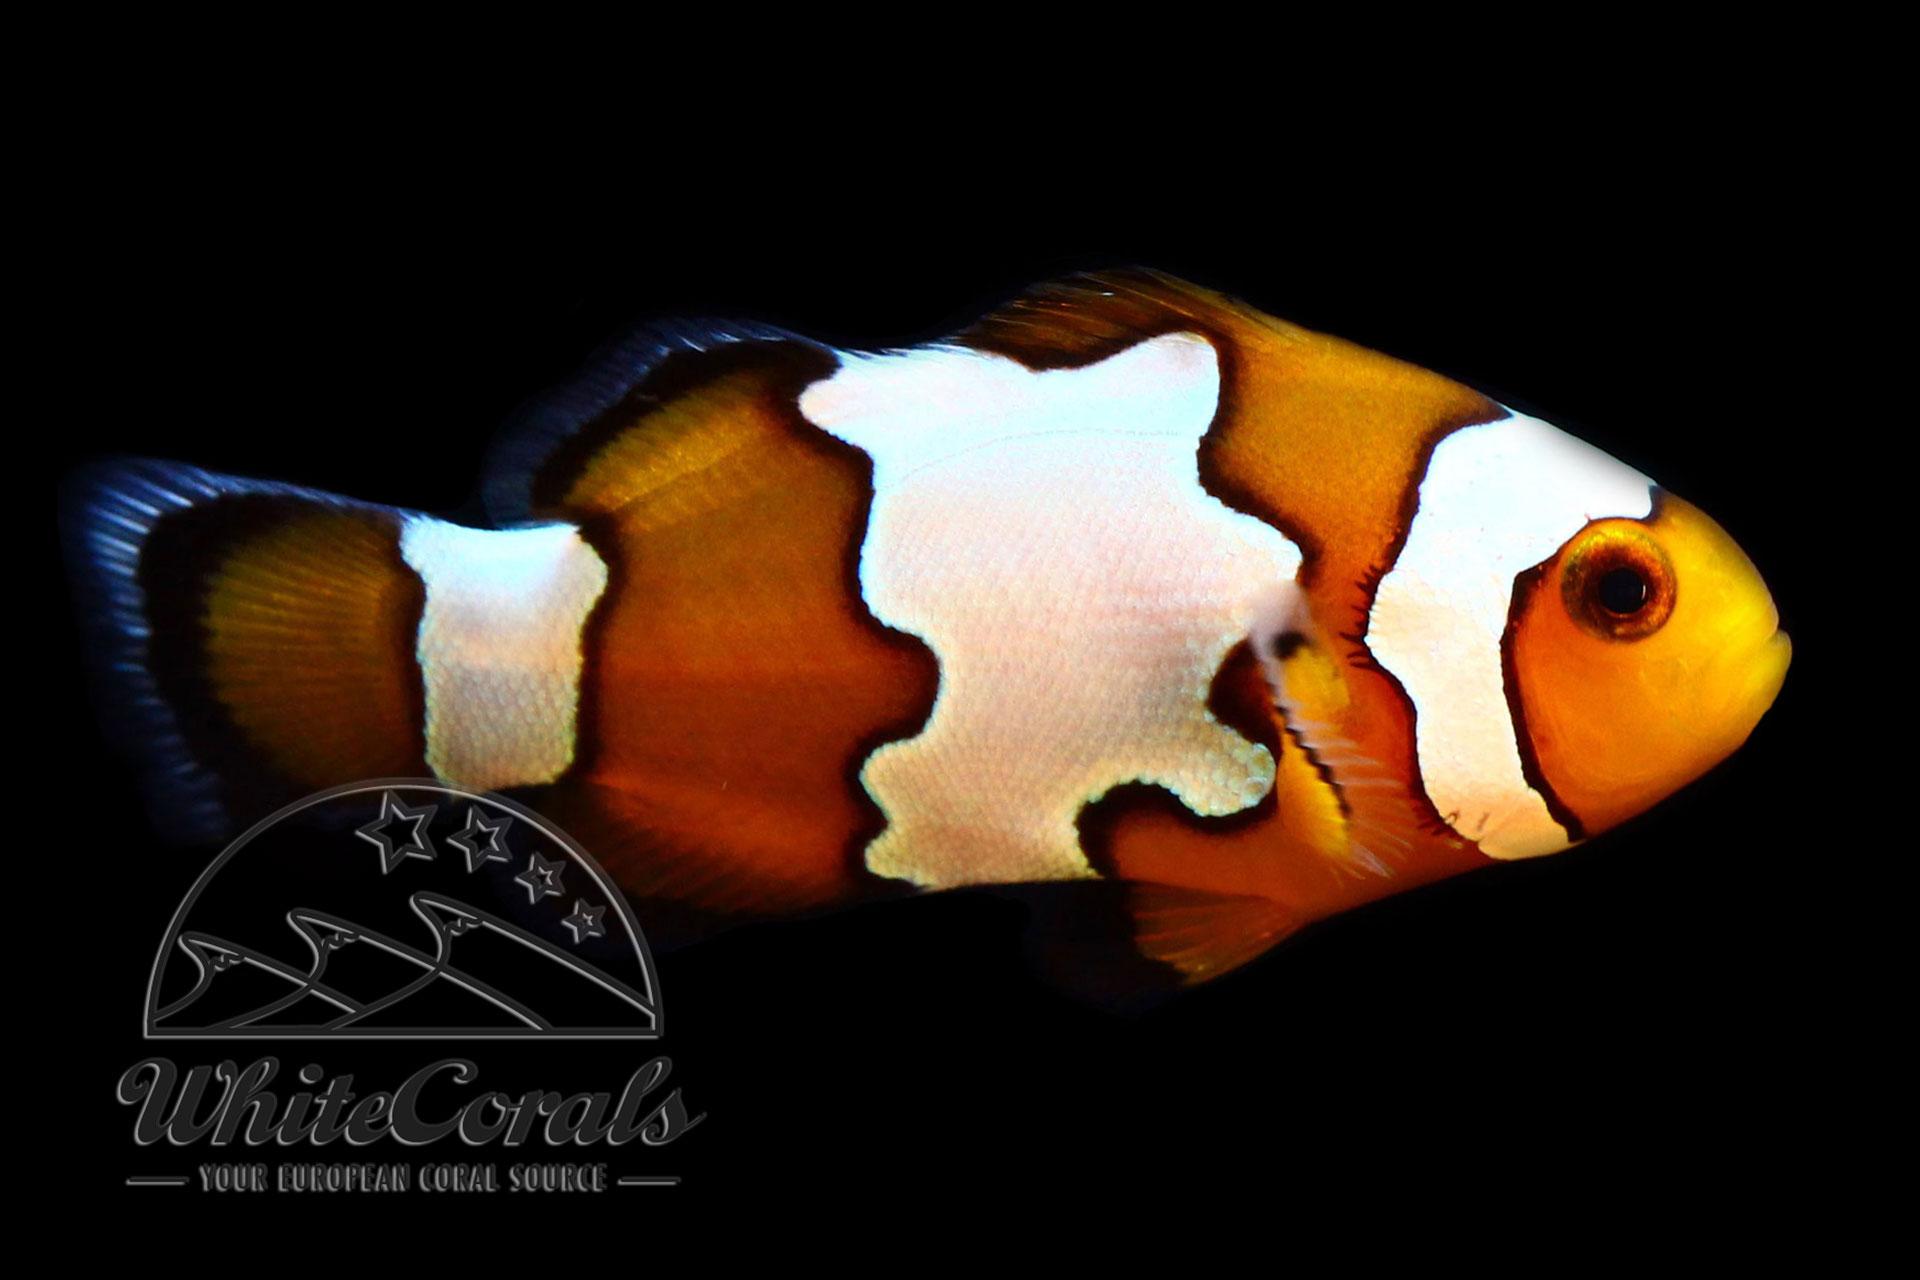 Amphiprion ocellaris - Snowflake Clownfisch